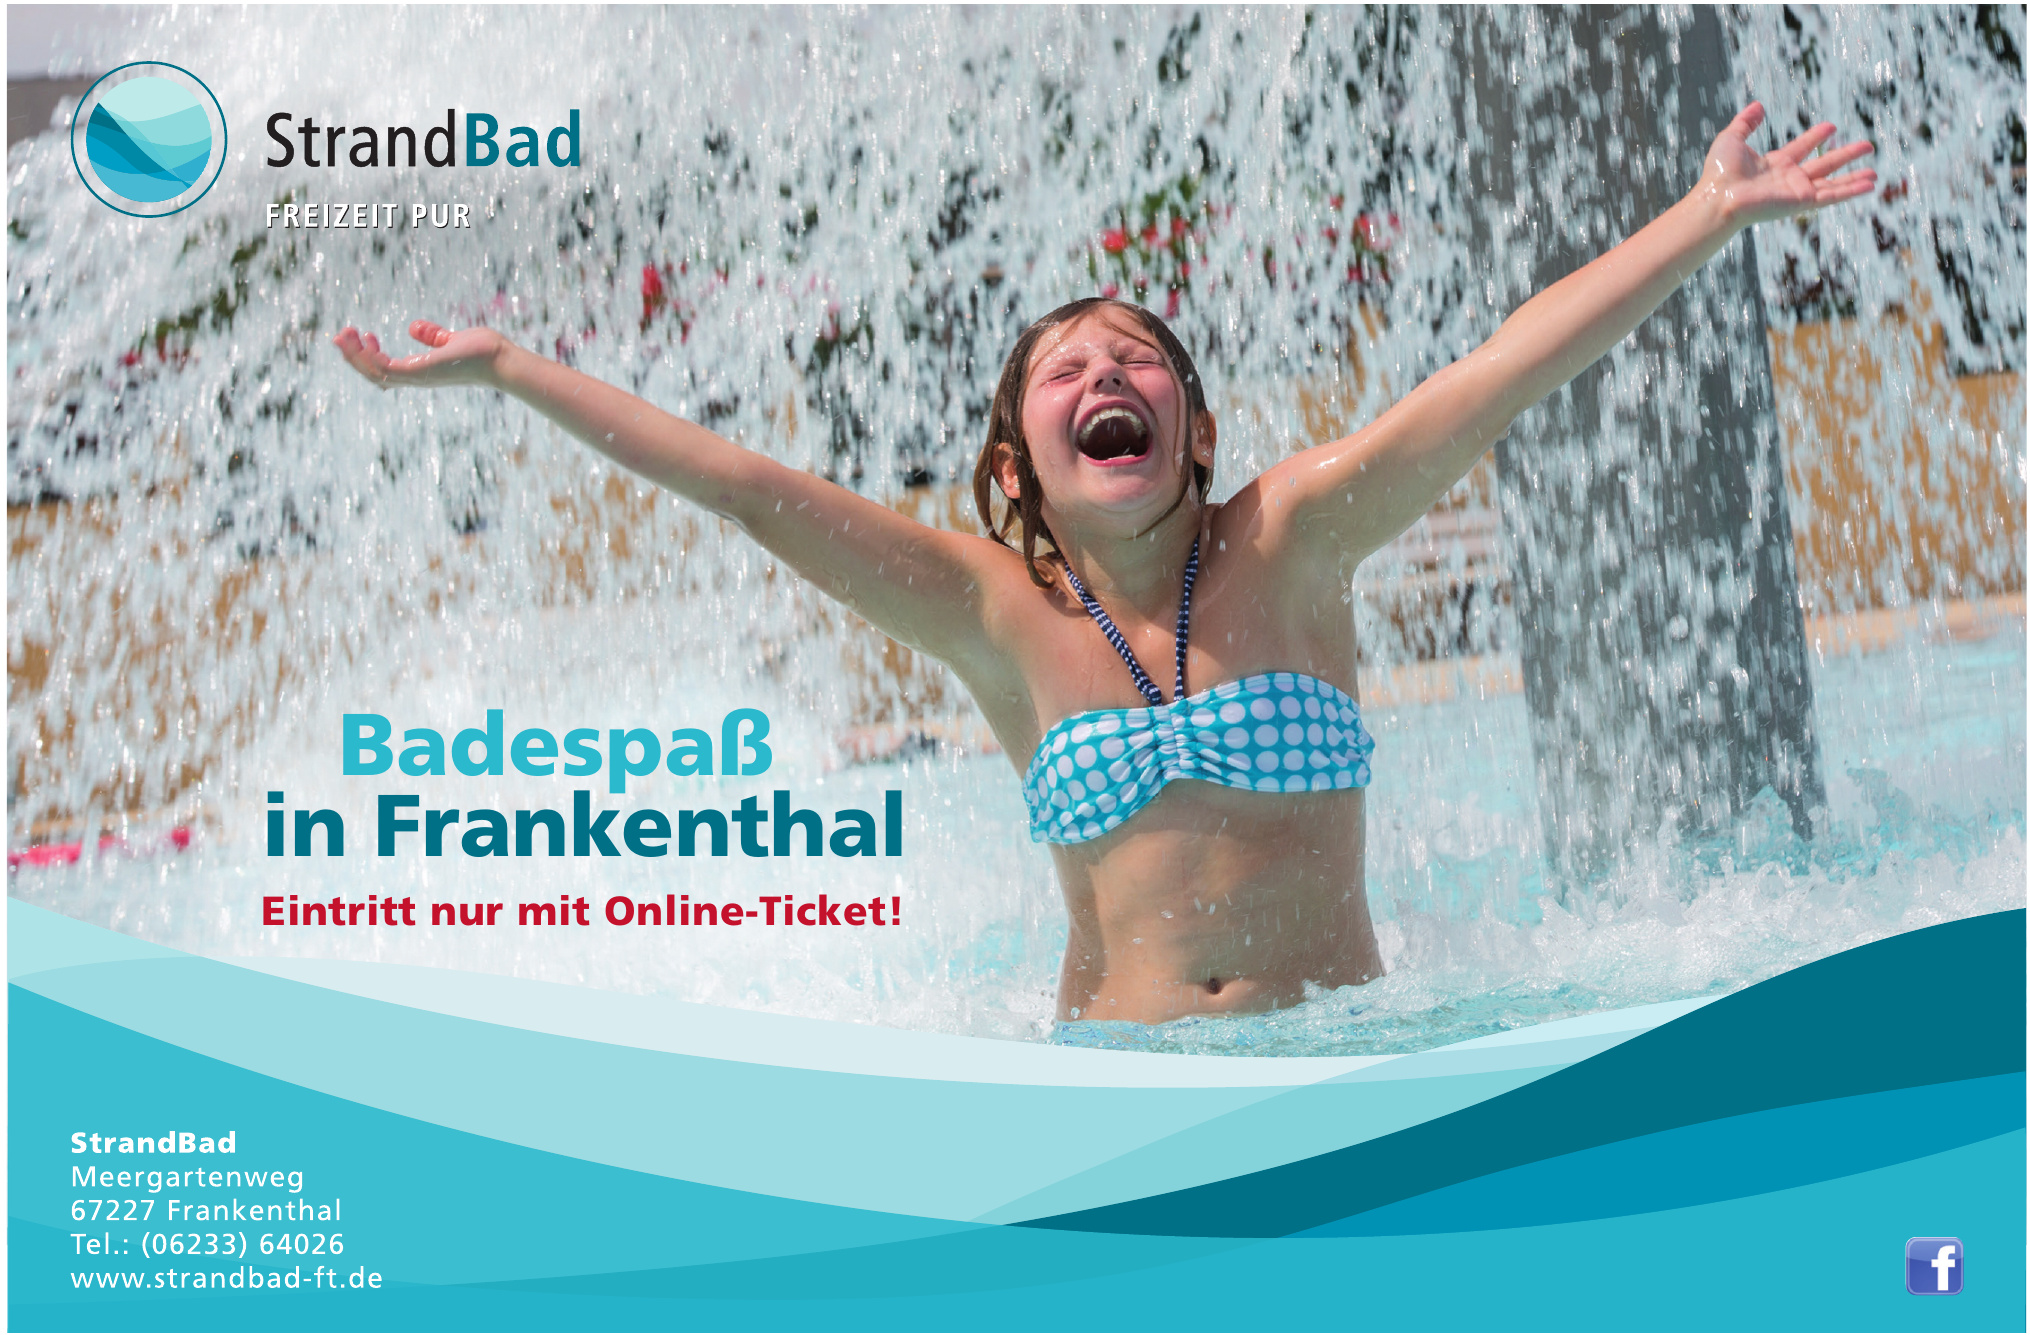 StrandBad Frankenthal